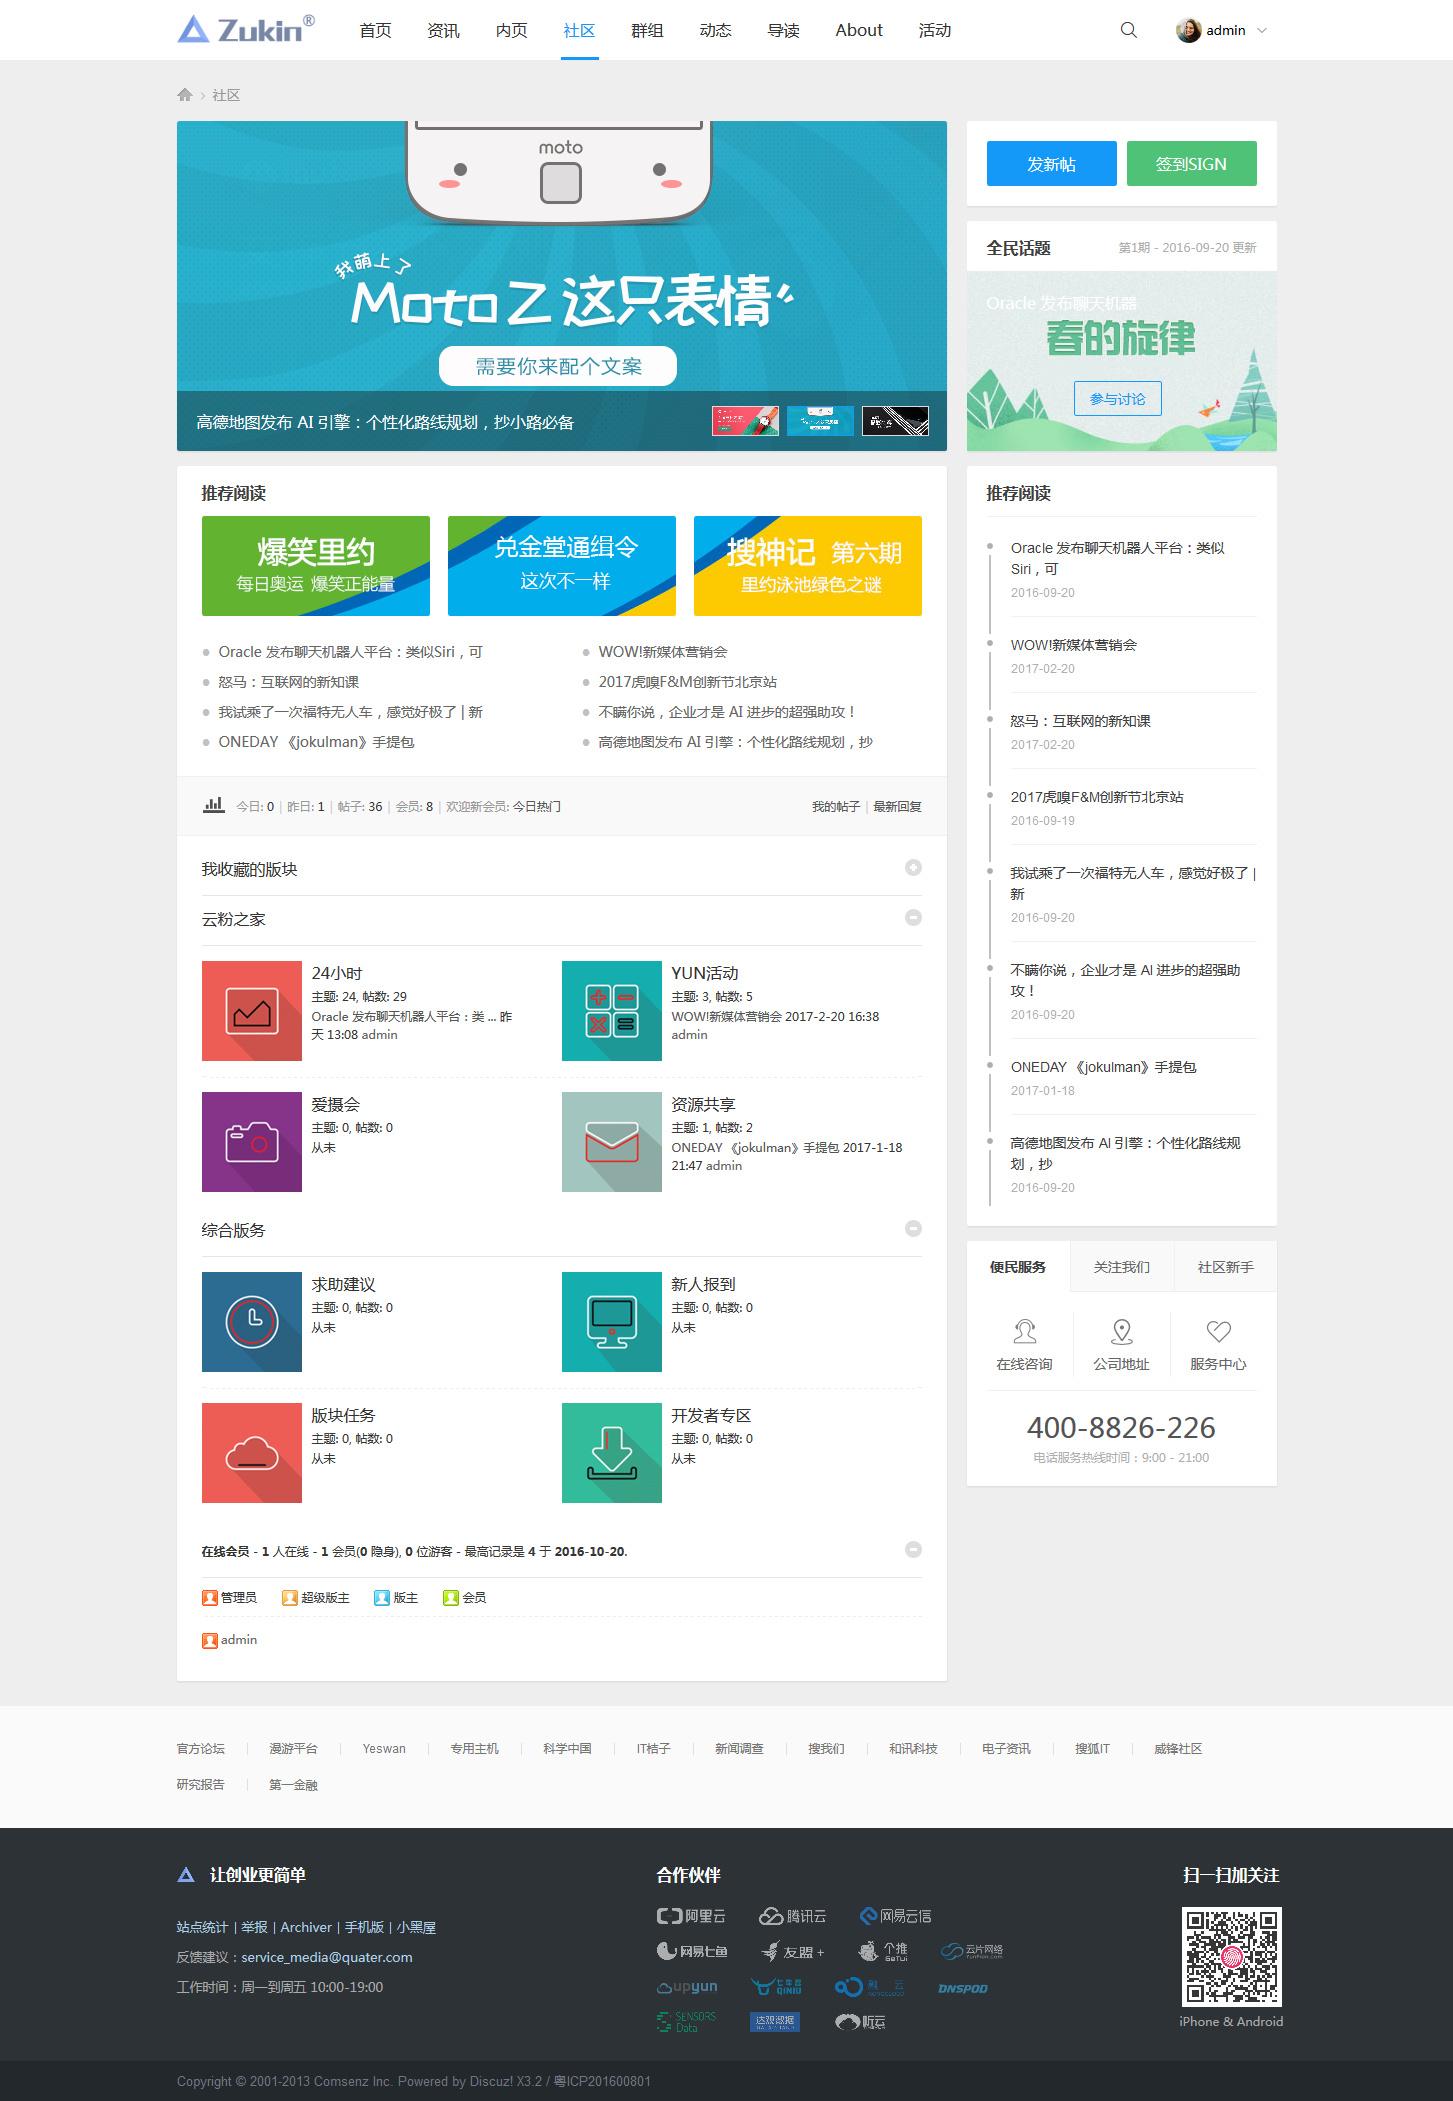 zuk新媒体互动商业版模板含手机版